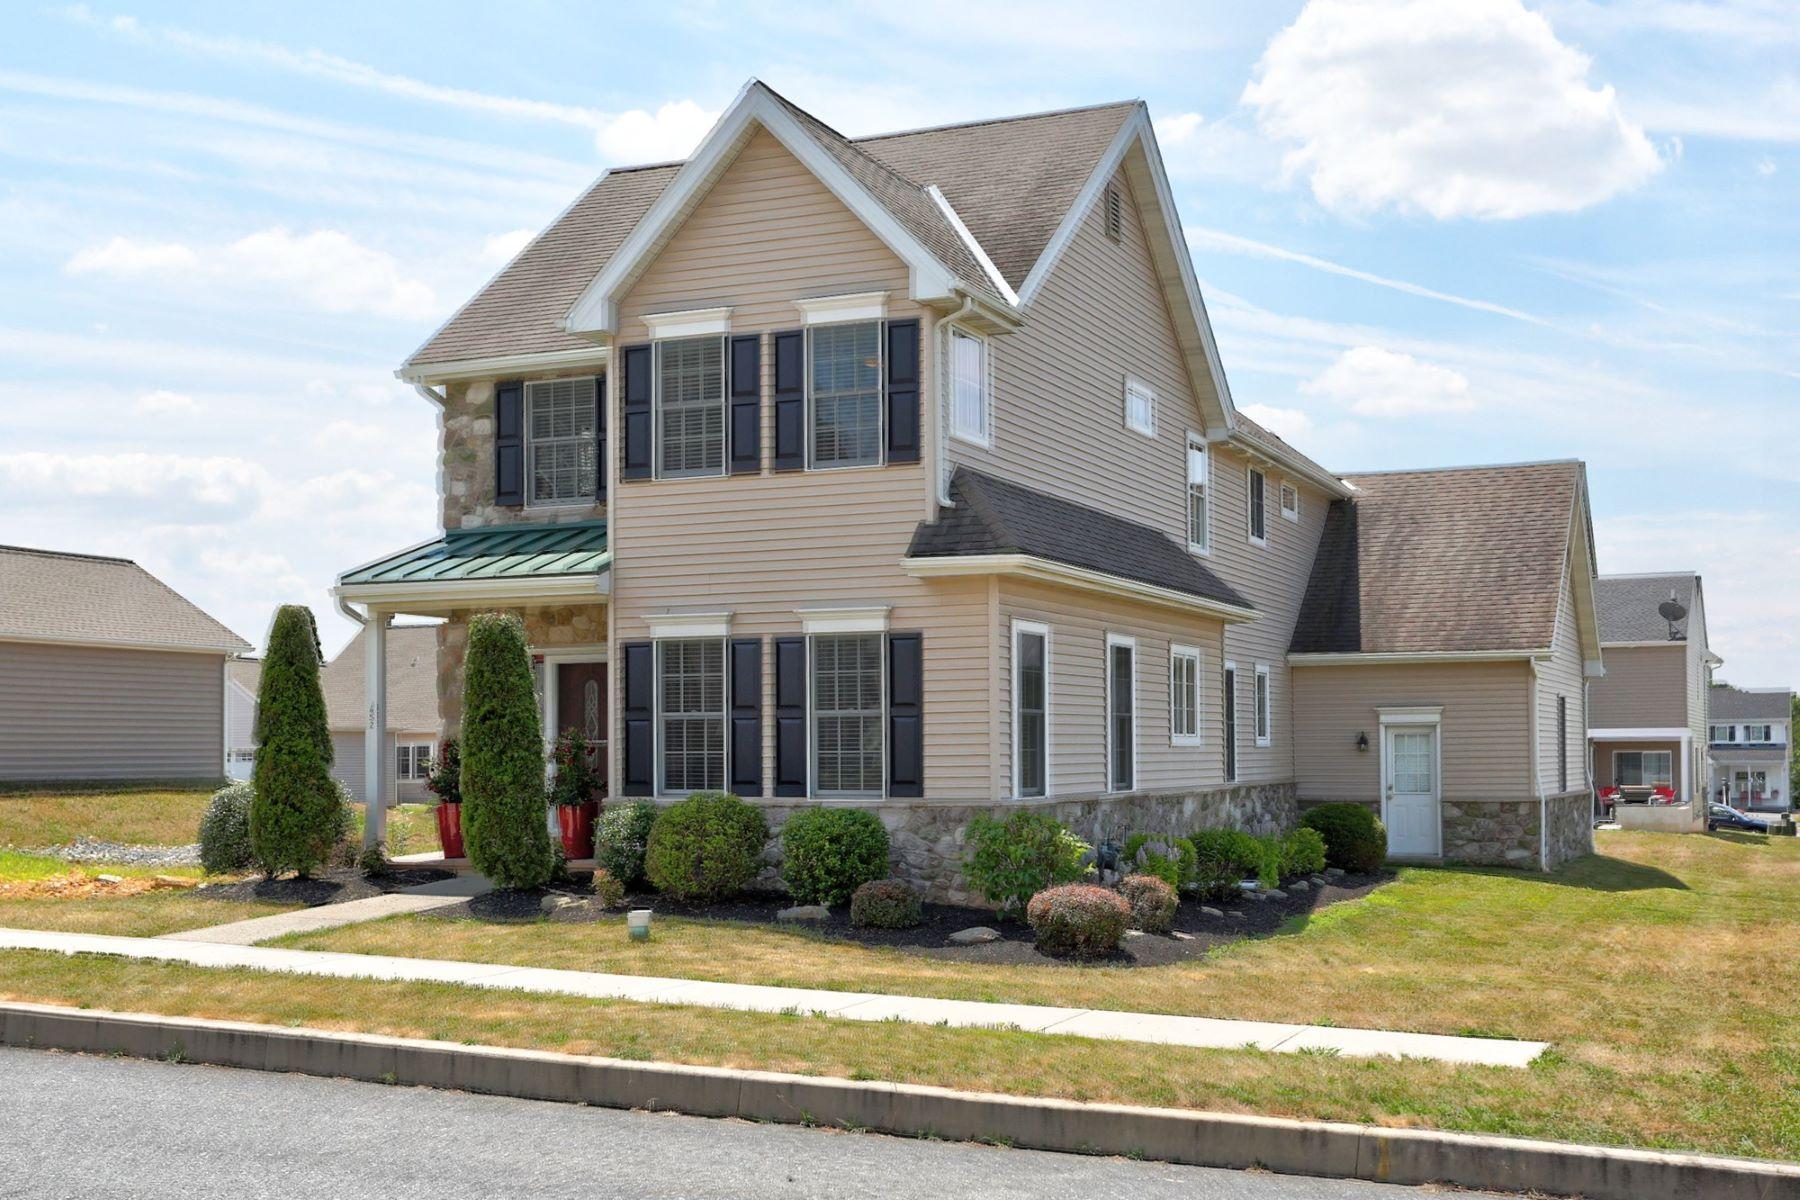 Casa Unifamiliar por un Venta en 652 Richmond Drive 652 Richmond Drive Lancaster, Pennsylvania 17601 Estados Unidos